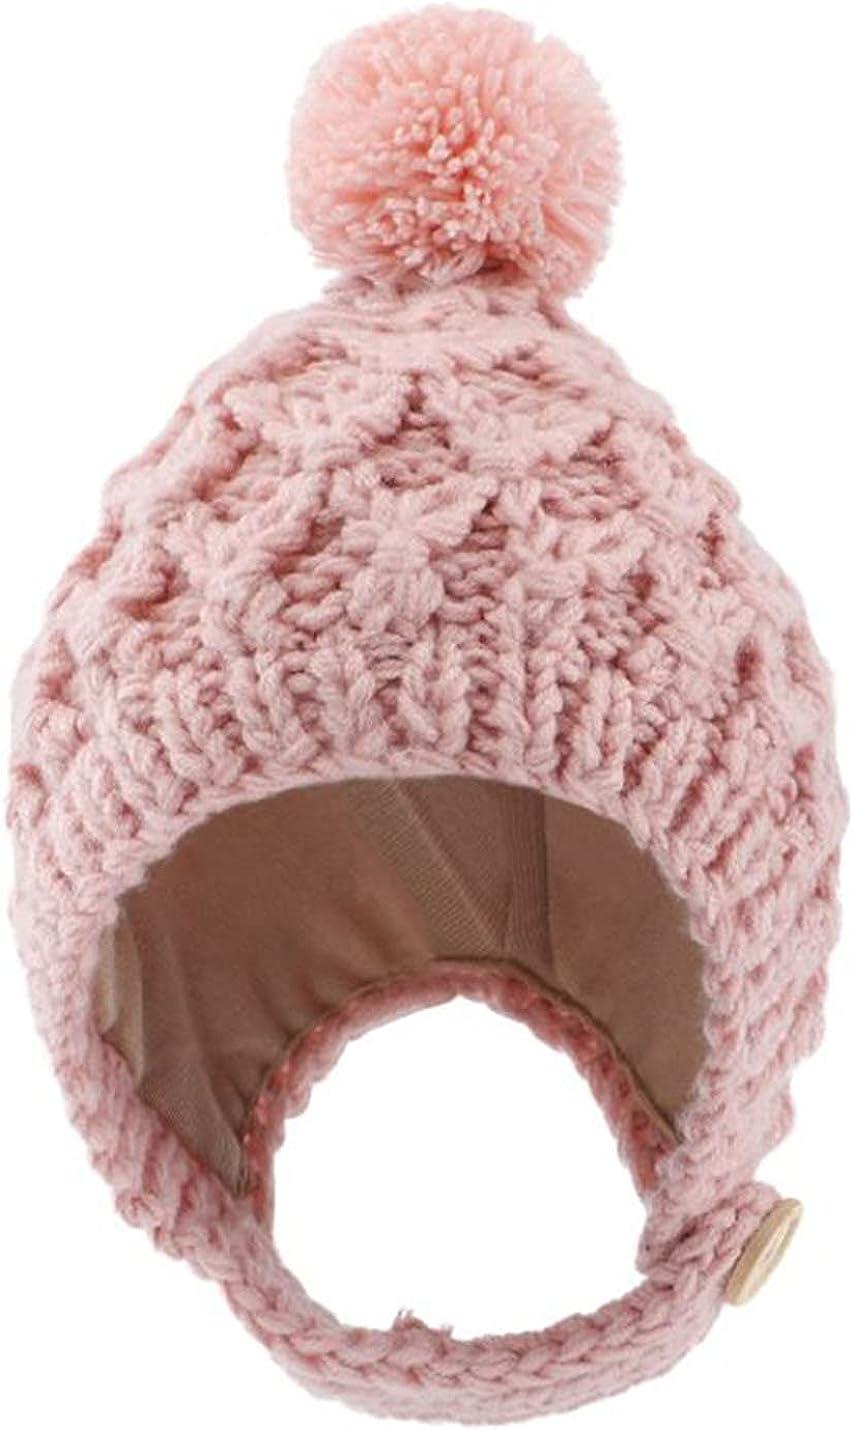 Beanie Hat for Kids Toddler Max 47% OFF Daily bargain sale Girls Winter Boys Skul Lining Fleece